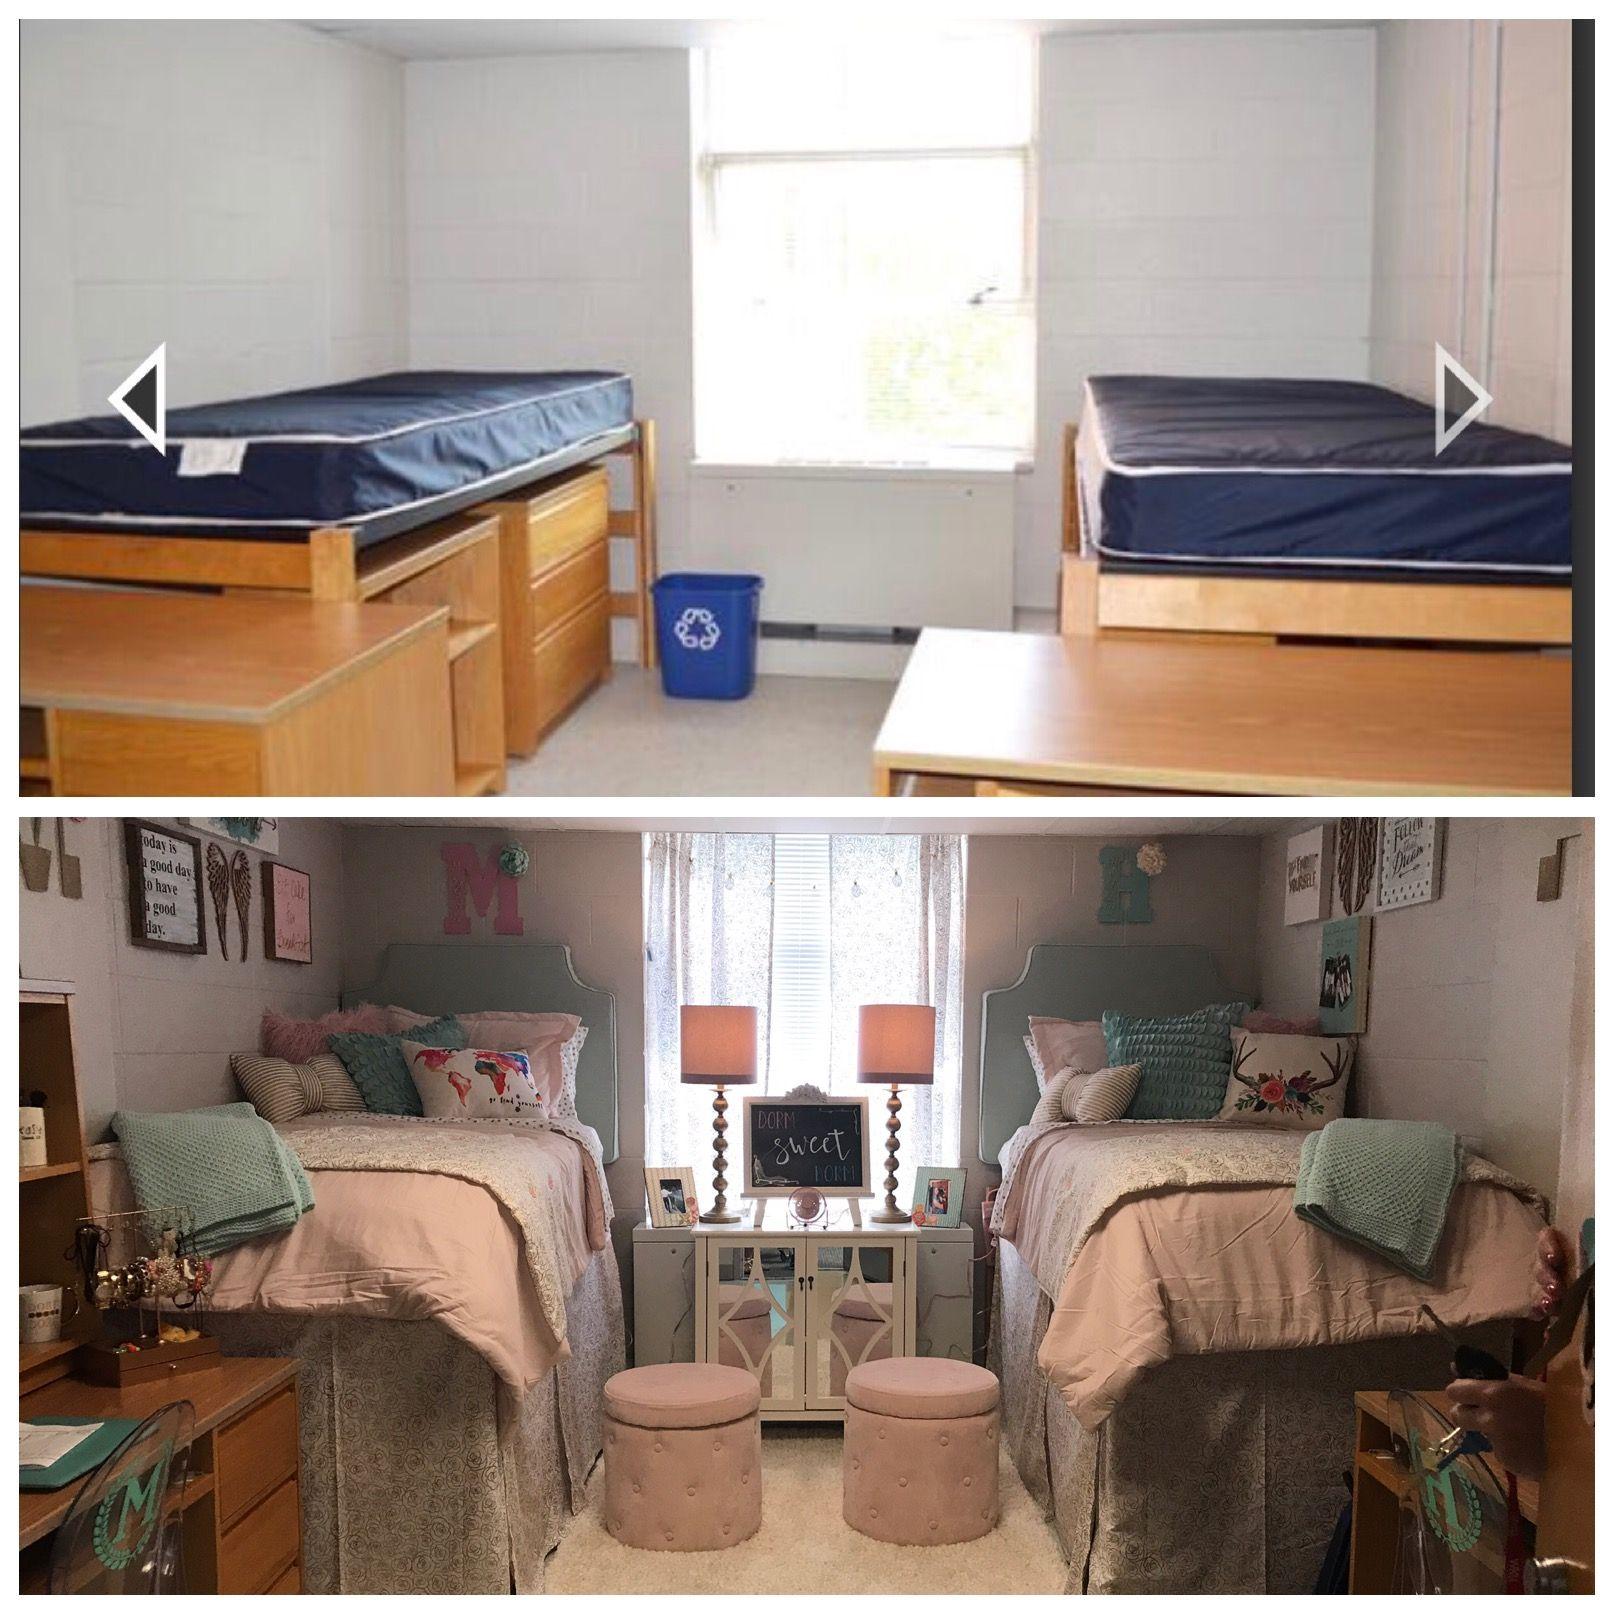 Best My Daughter S Dorm Room Makeover At Wku Wku2021 Kentucky 400 x 300